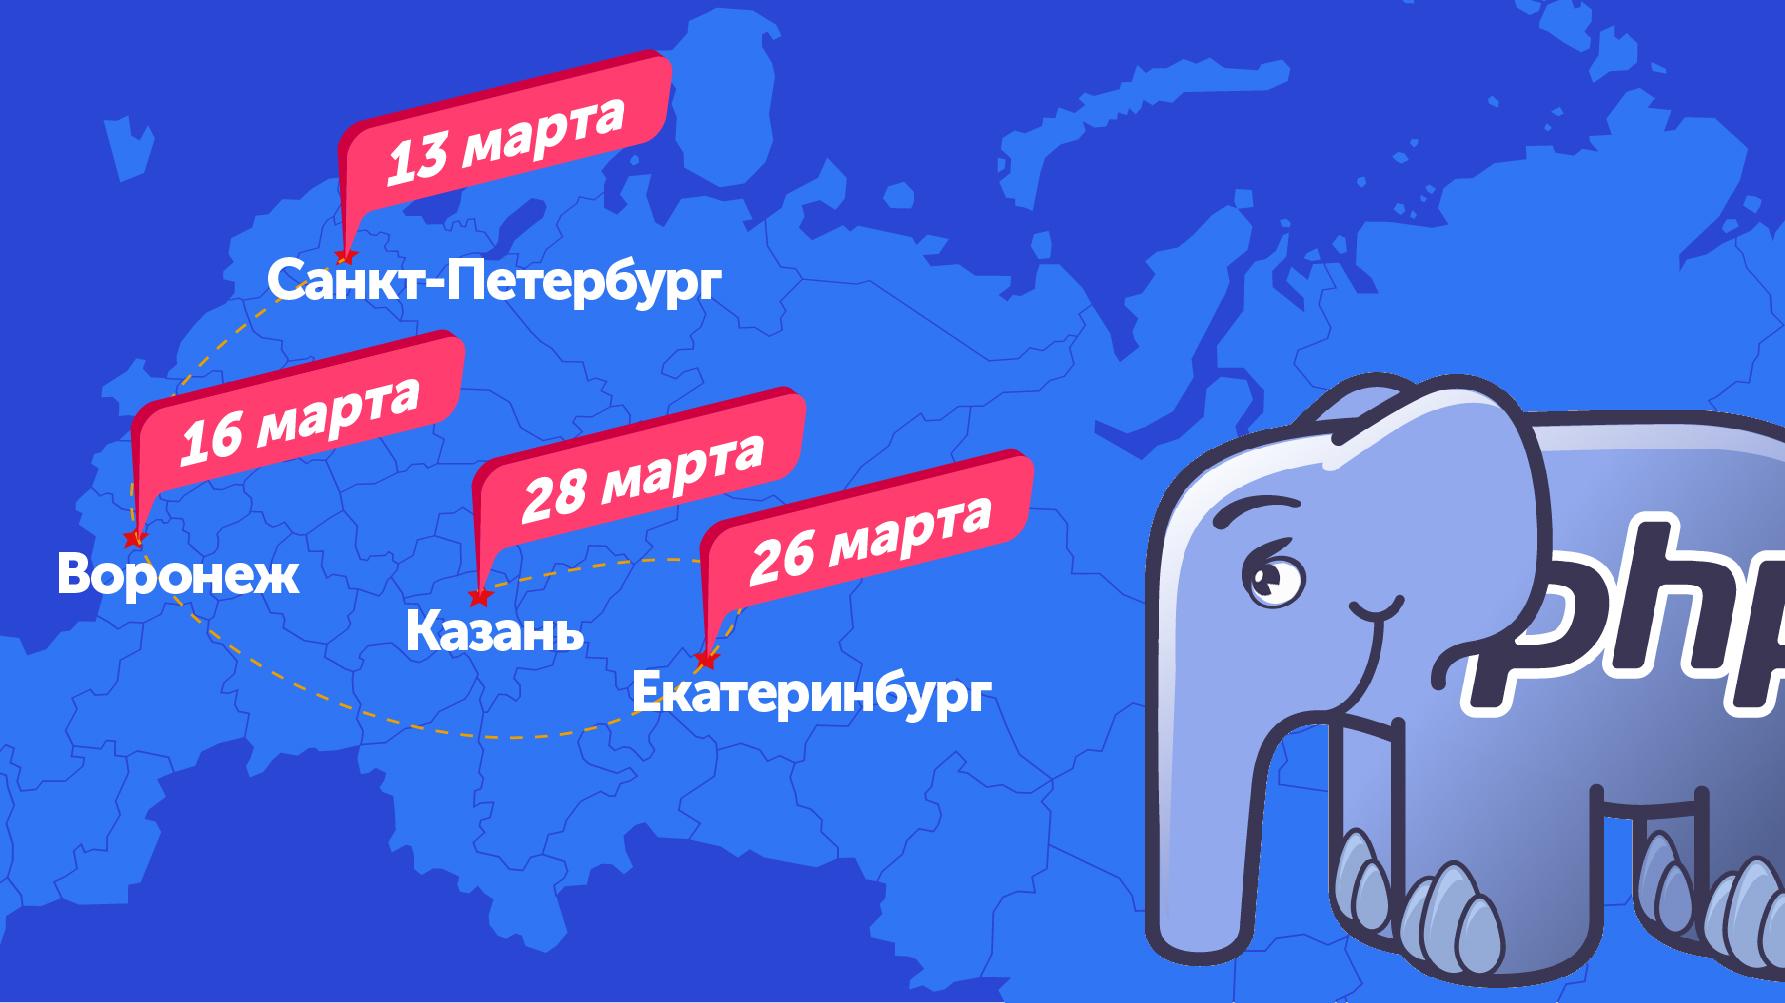 Митапы PHP-сообществ в марте: Питер, Воронеж, Екатеринбург, Казань